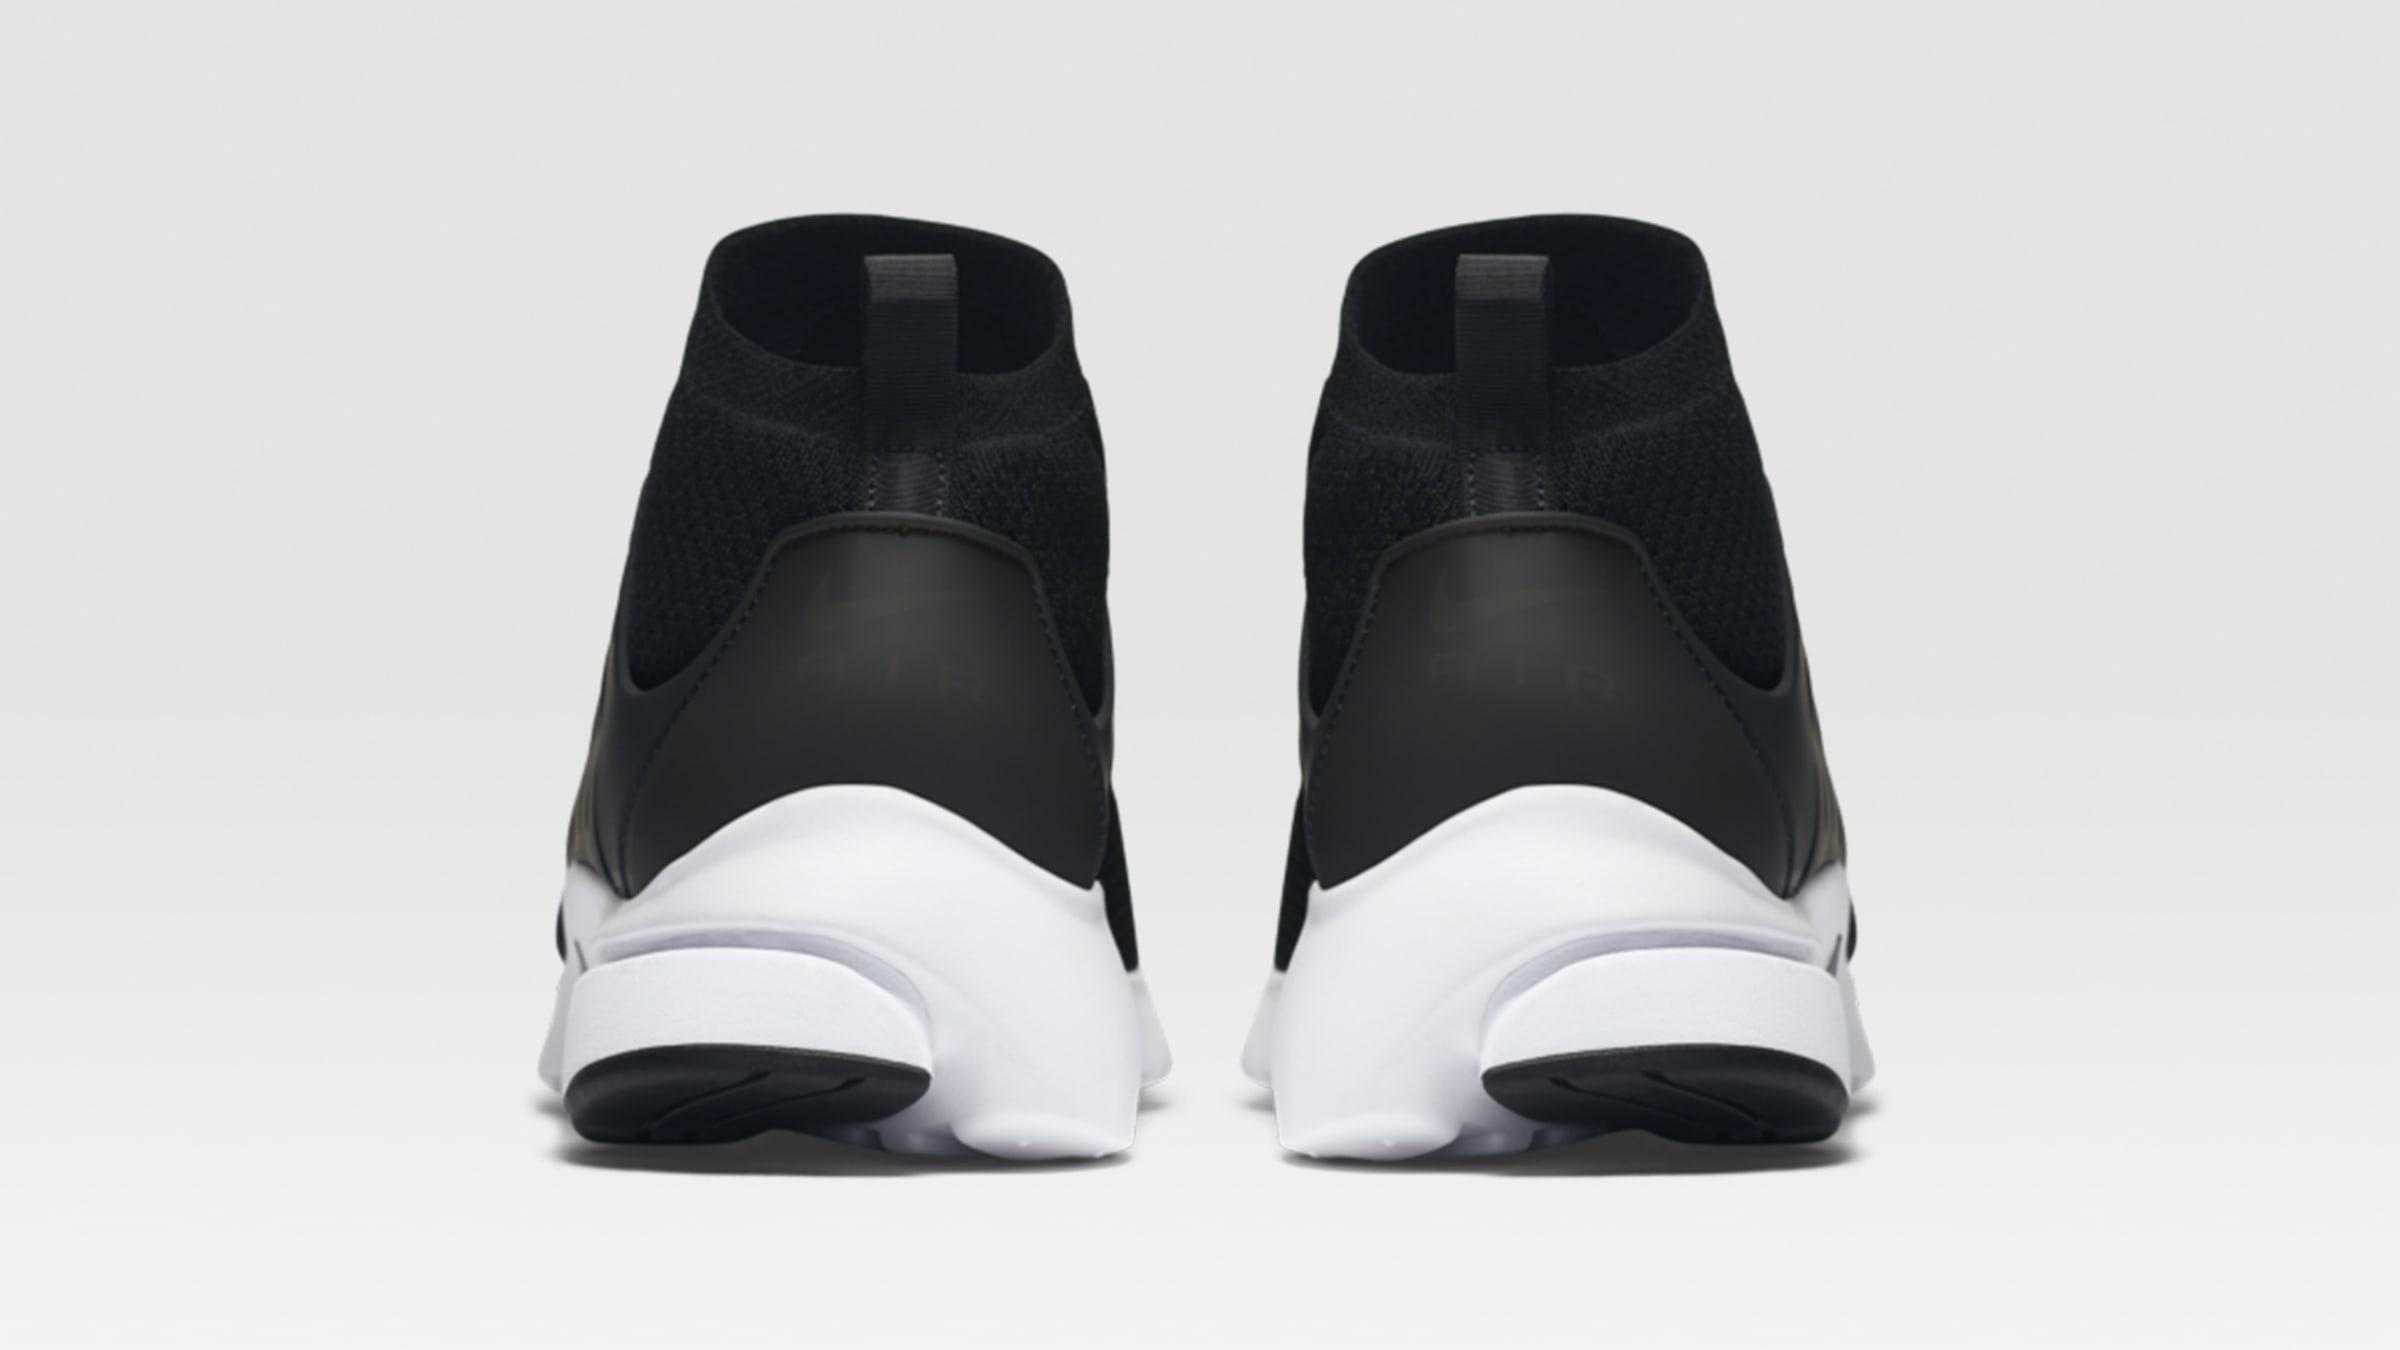 pretty nice 7432d 2f0b2 Nike Air Presto Ultra Flyknit. Black, White   Electric Green